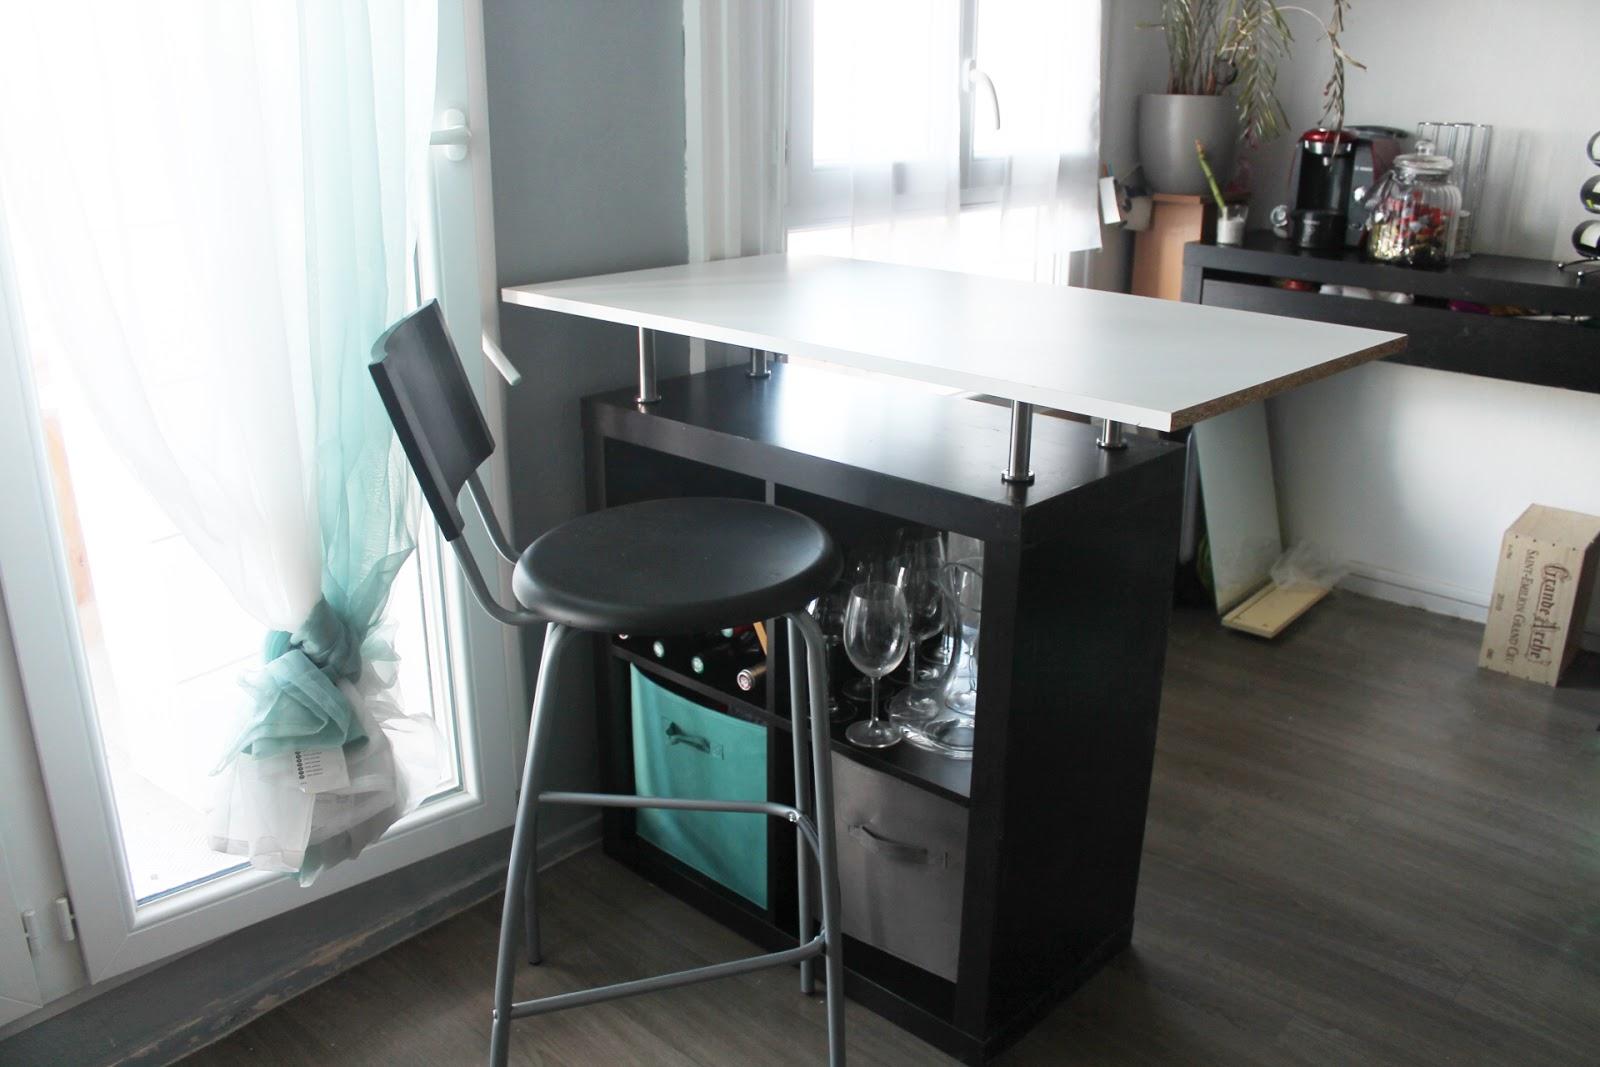 Ikea Cuisine Meuble Haut Cuisine Meuble Haut Cuisine Ikea Avec  # Meuble Haut Bois Ikea